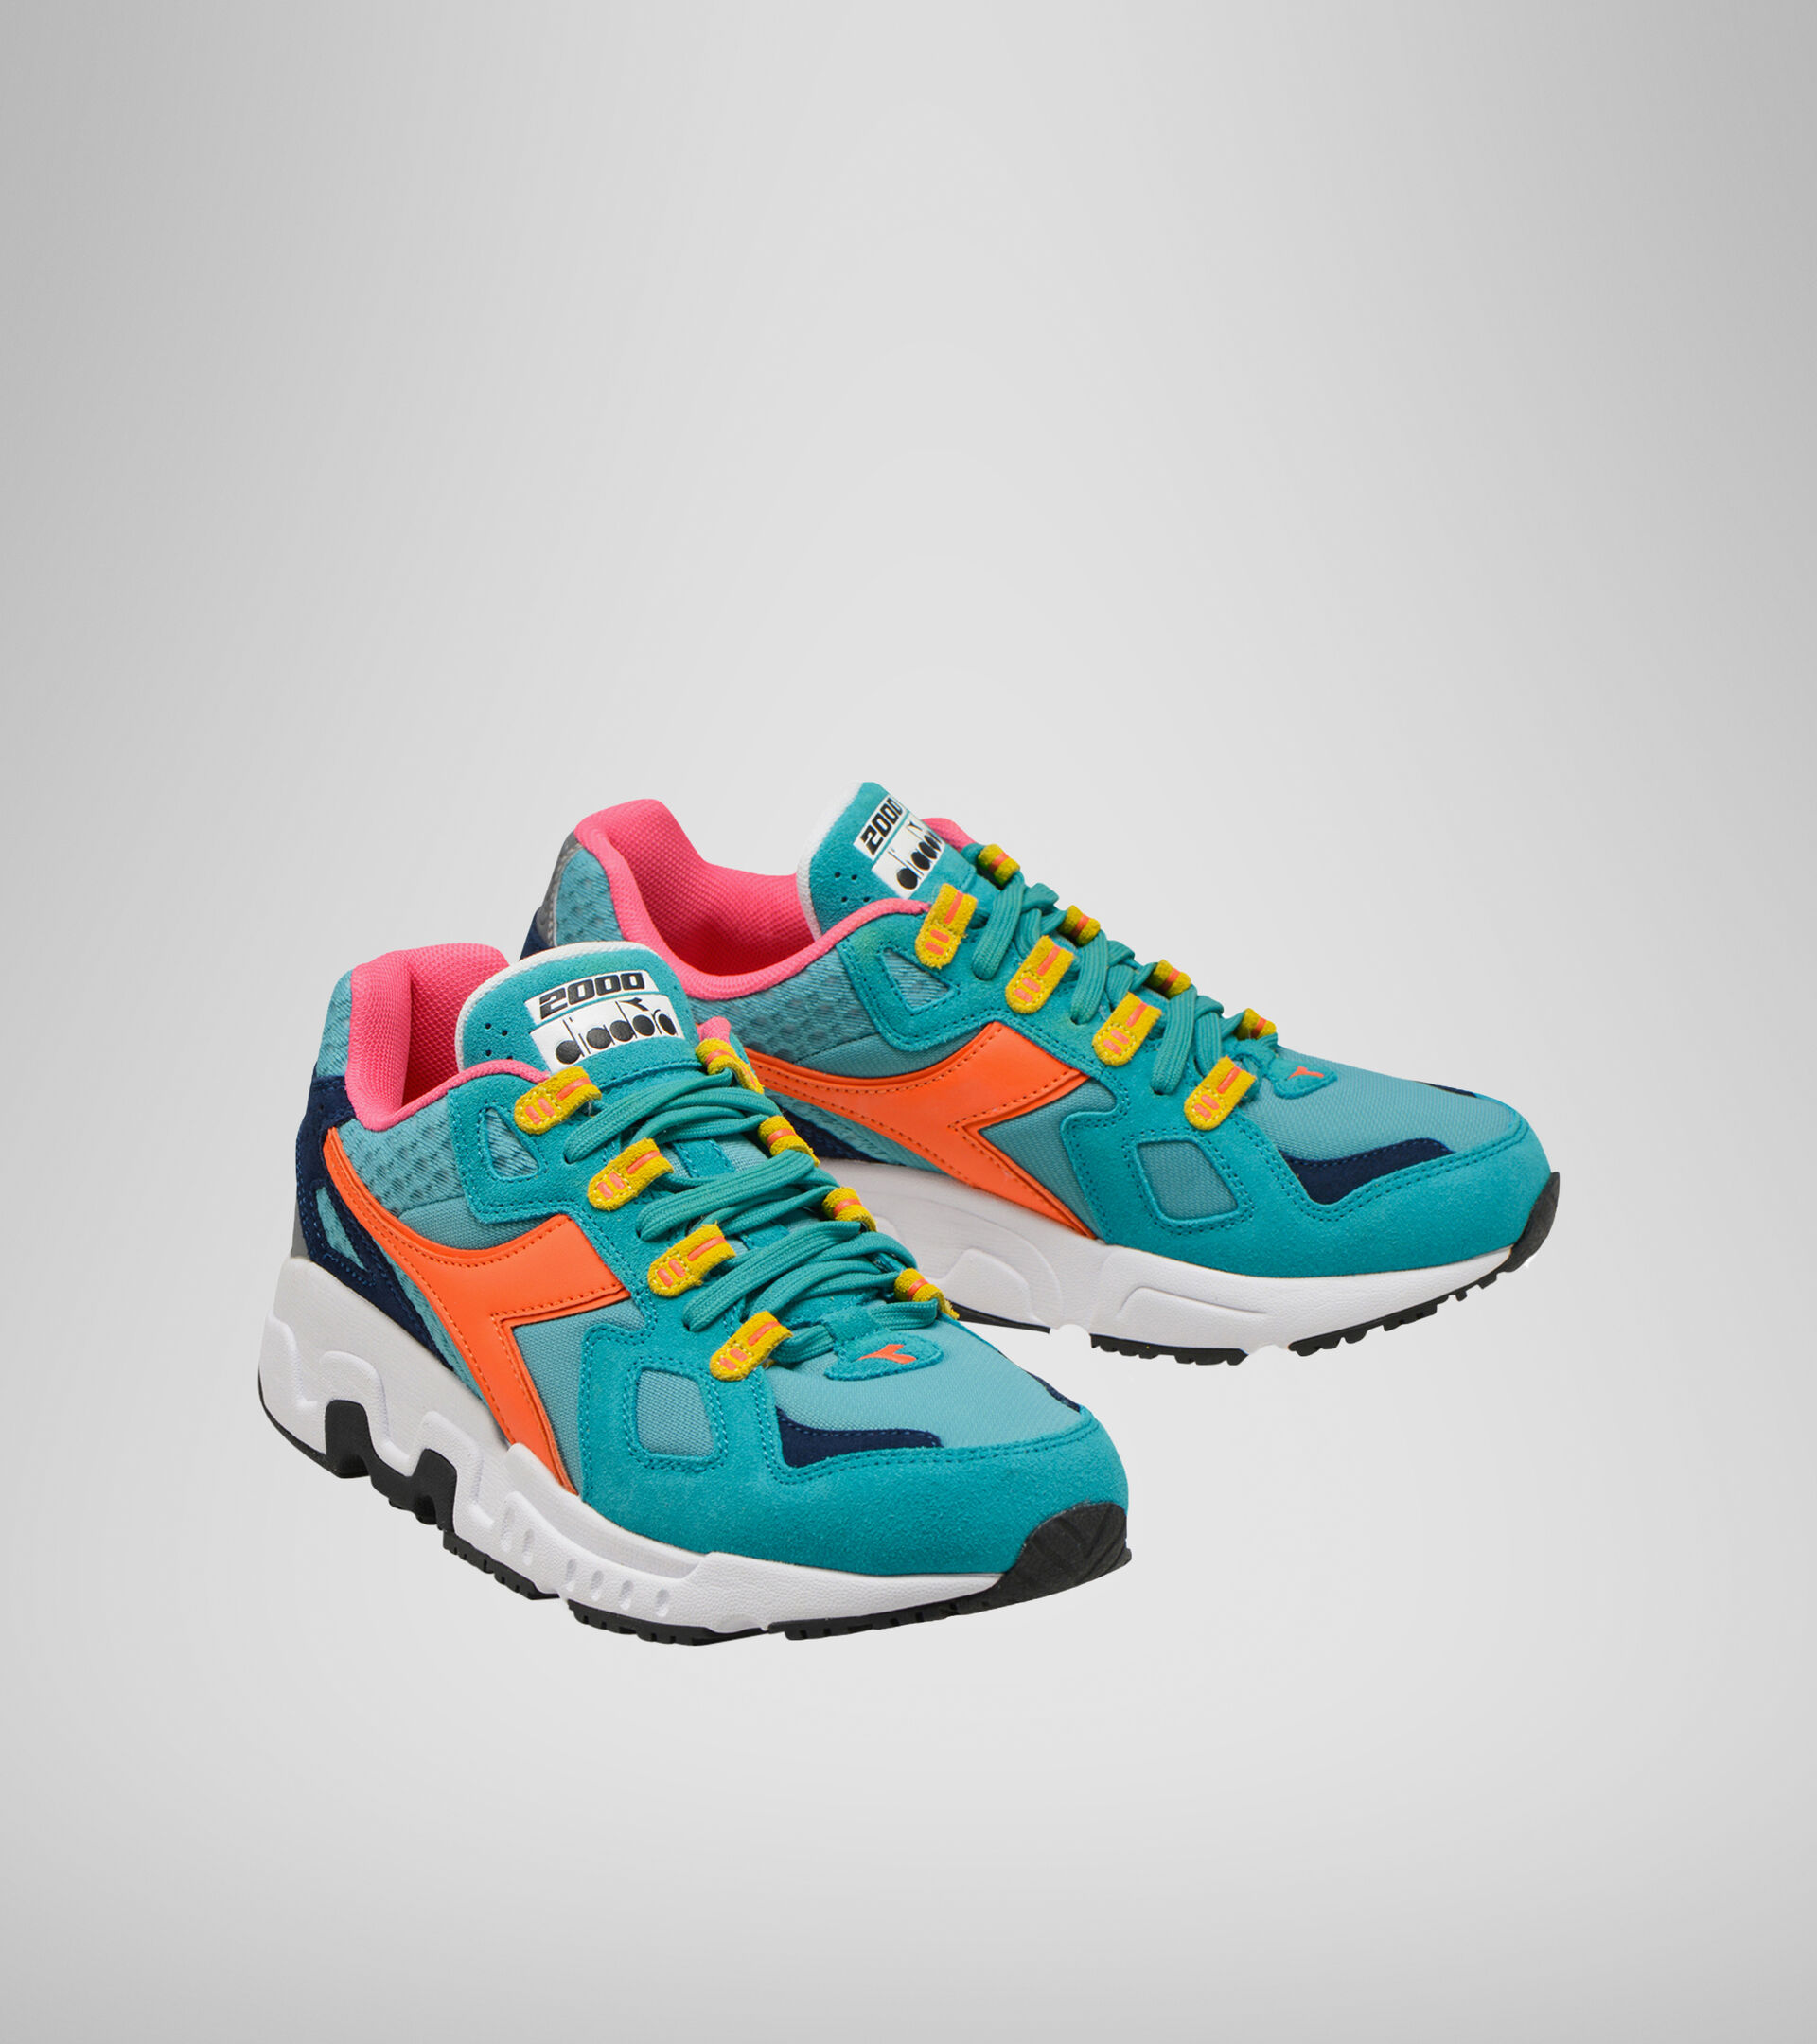 Footwear Sportswear UOMO MYTHOS OUTDOOR ACQUA GREEN Diadora